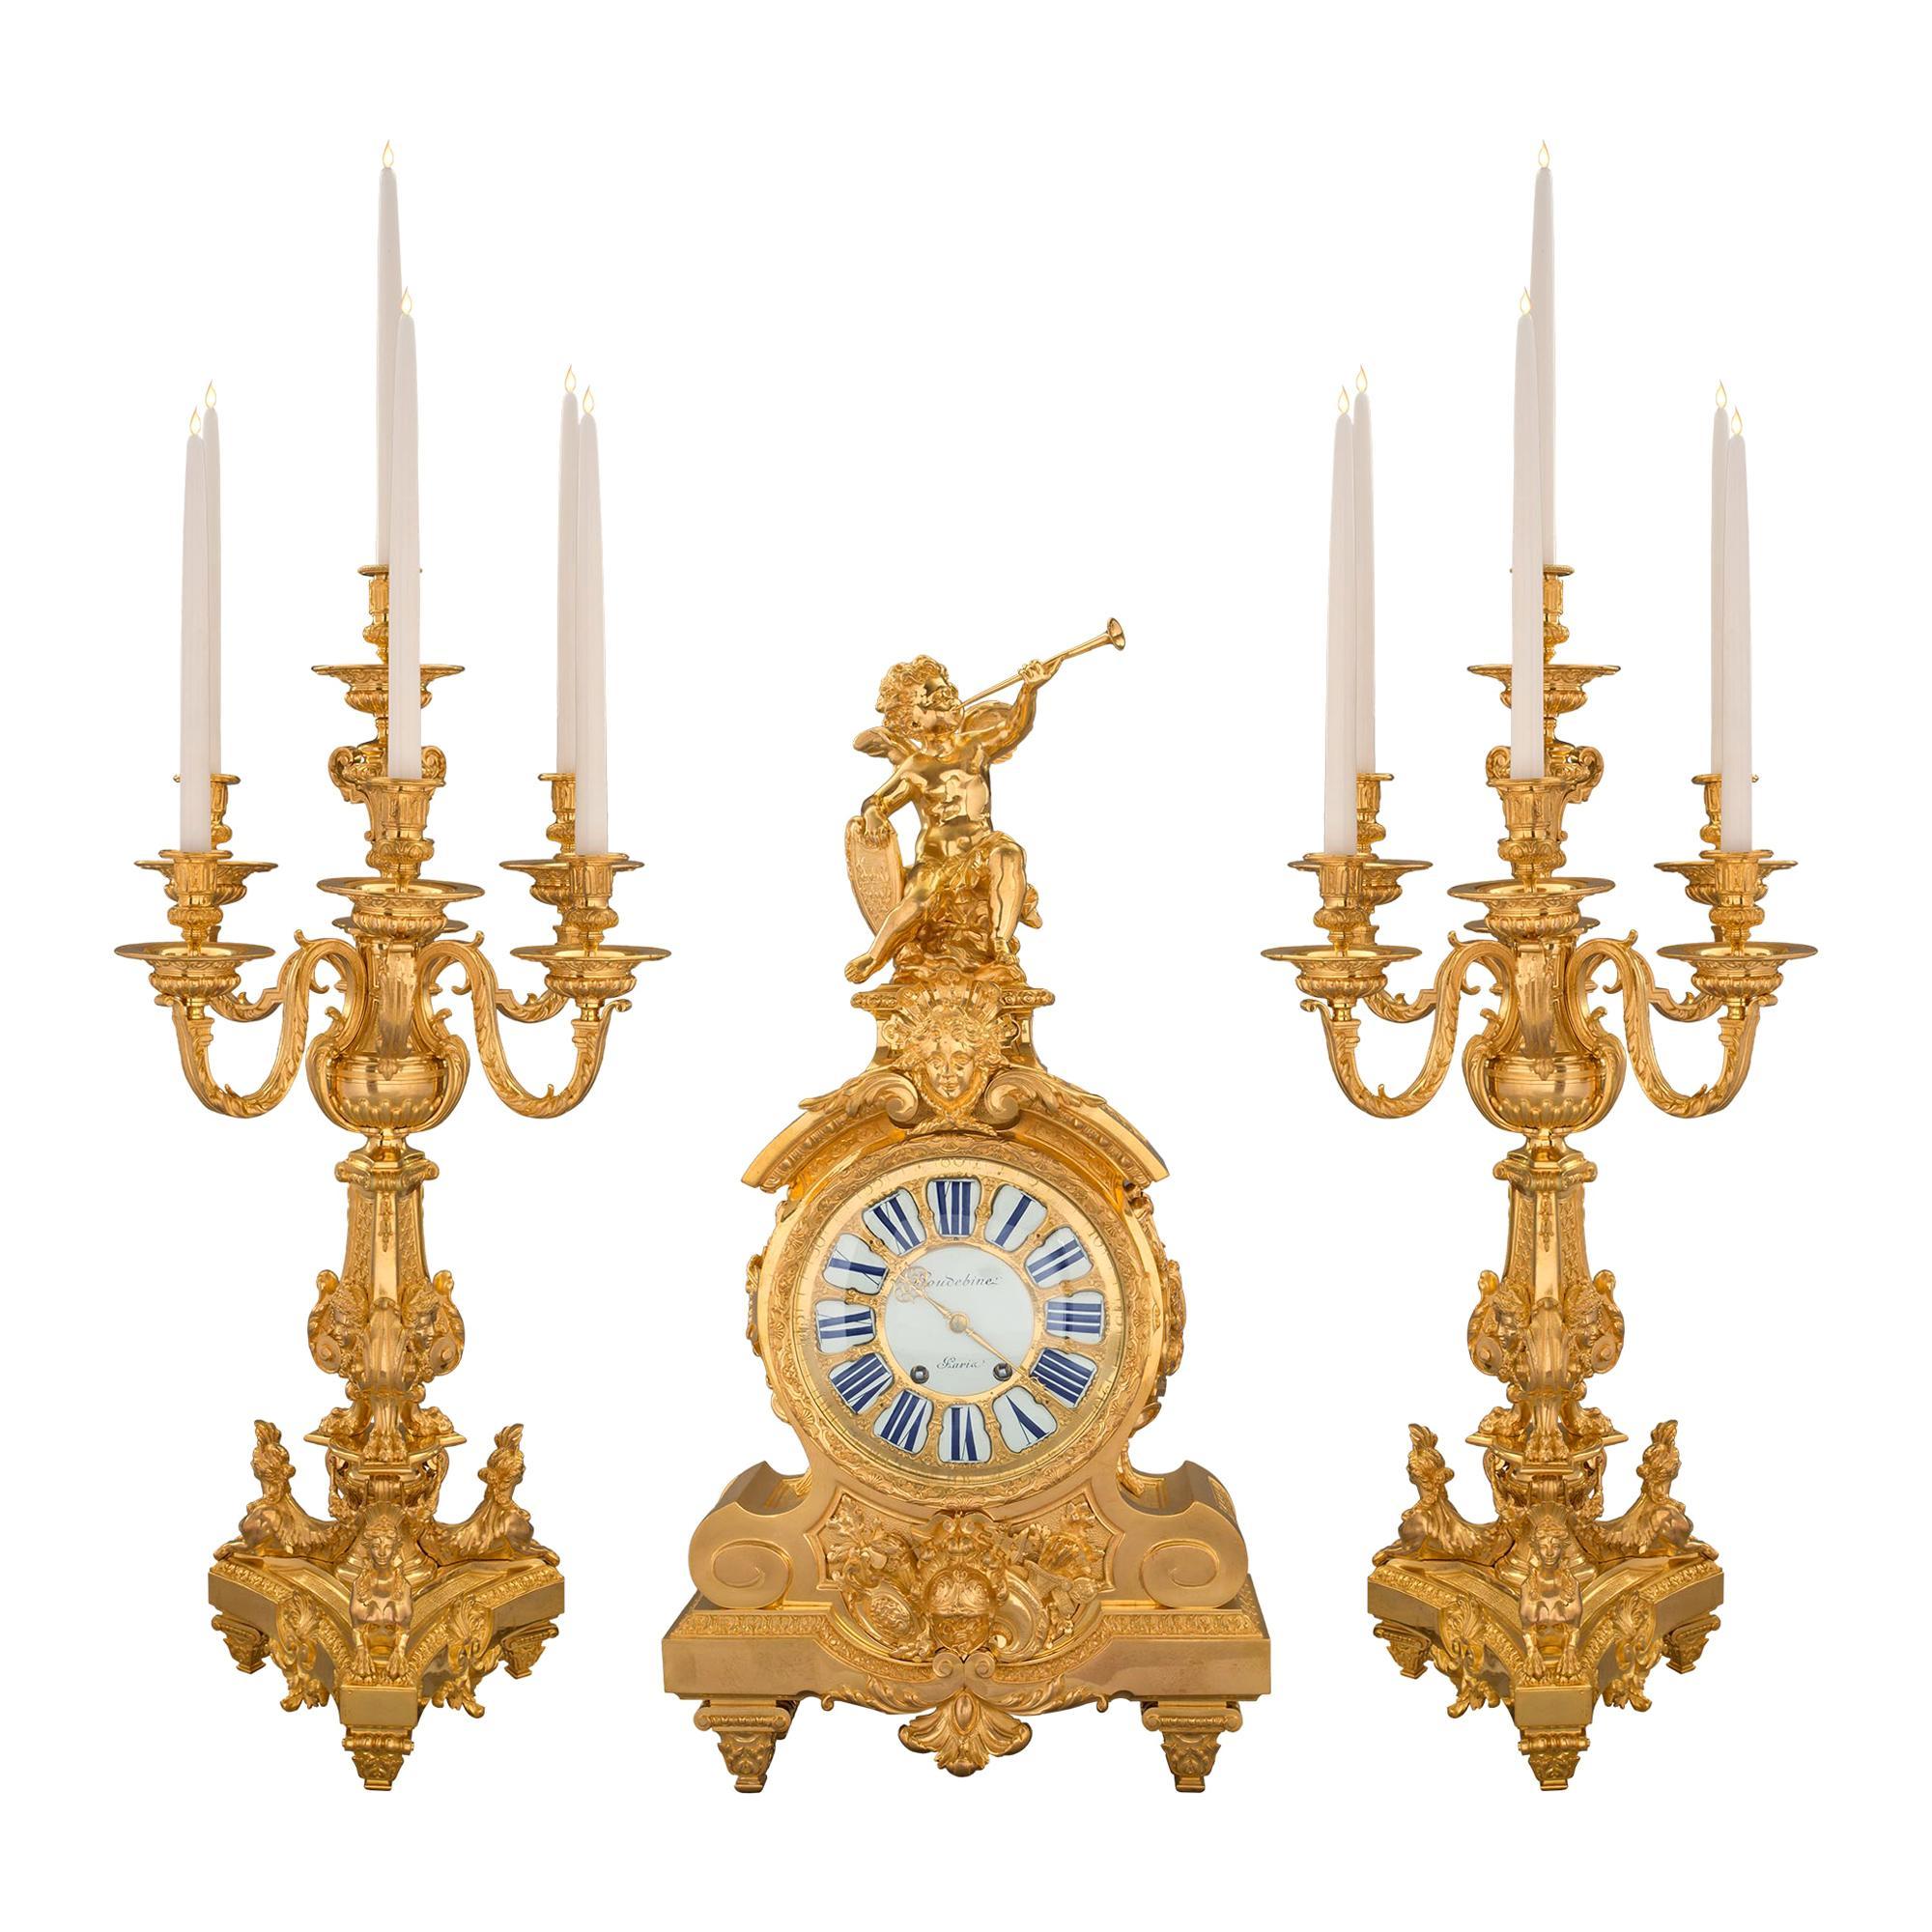 French 19th Century Louis XIV Style Ormolu Three-Piece Garniture Set